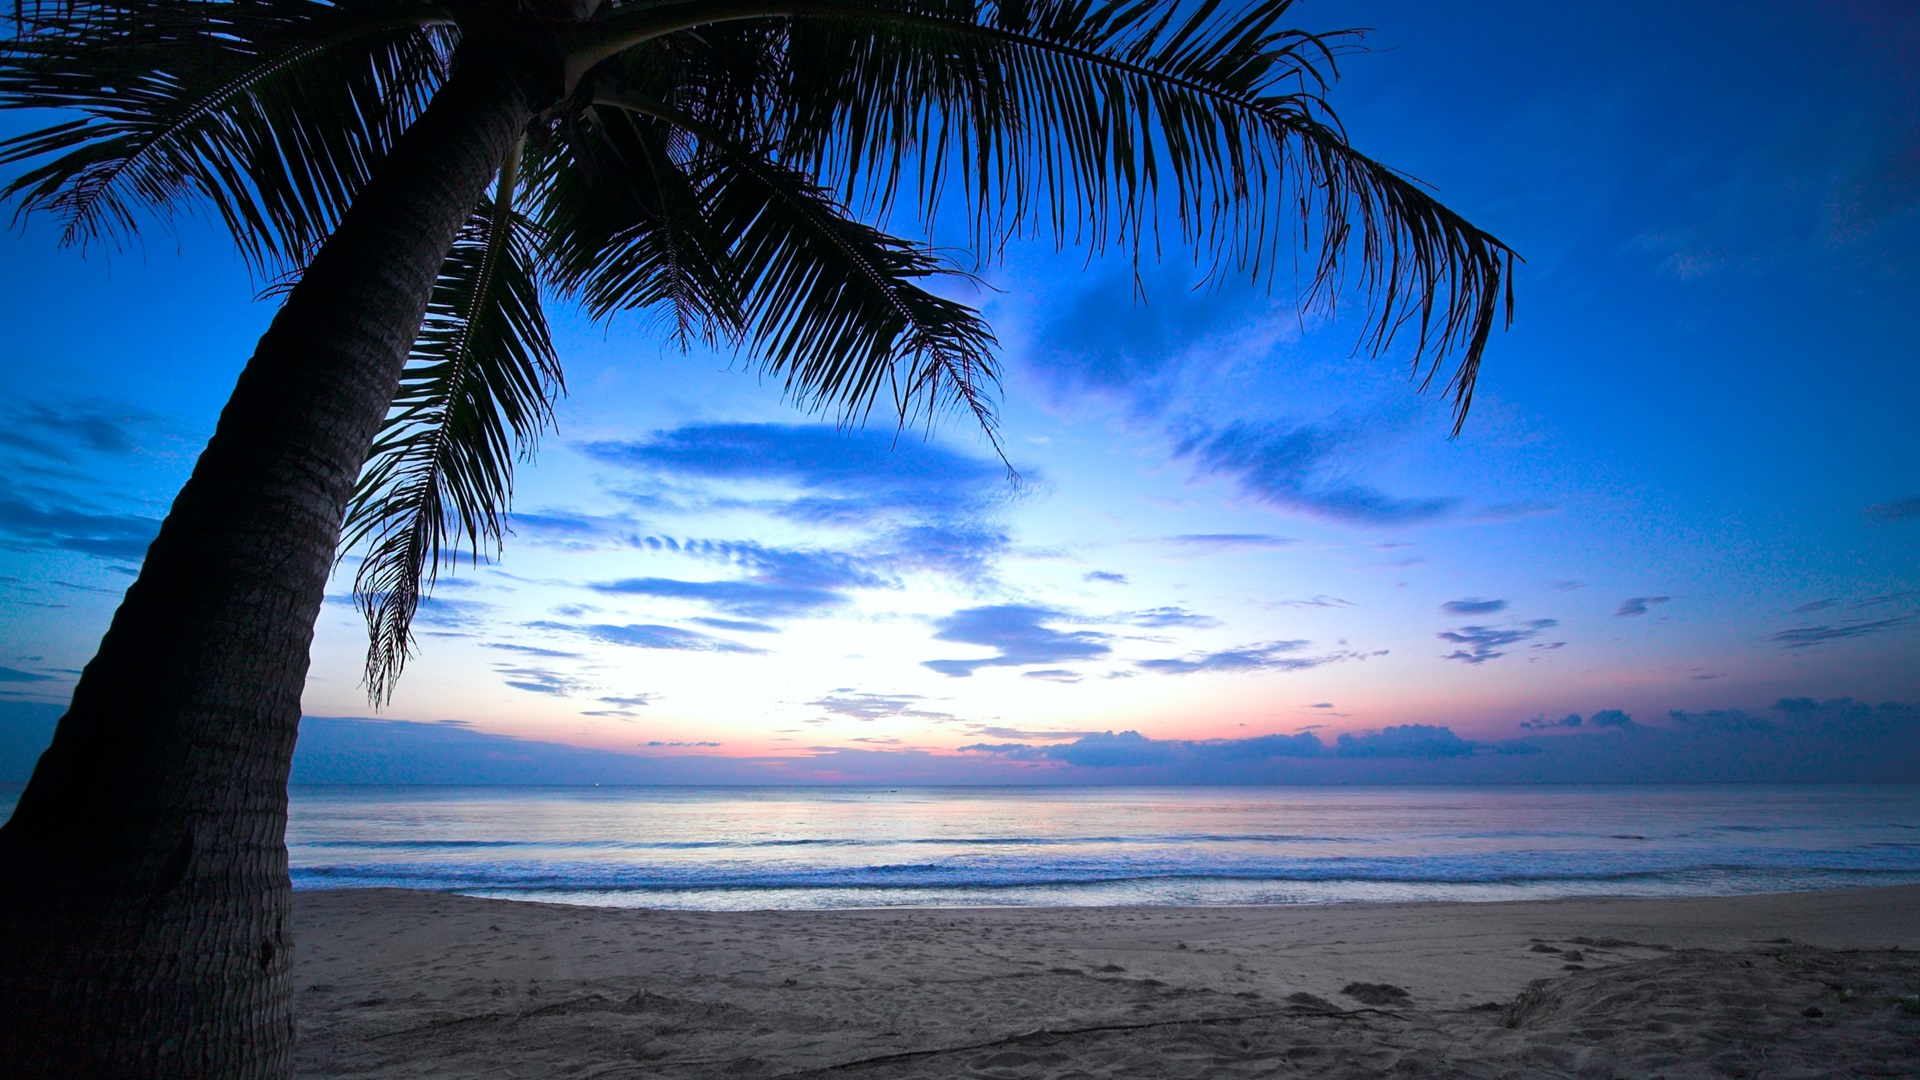 Wallpaper Caribbean Sea Beach Sunset Palm Trees Hd 5k: 壁紙 トロピカル、ヤシの木、曇り空、カリブ海、海、海岸、夜明け、日光 2560x1600 HD 無料のデスクトップの